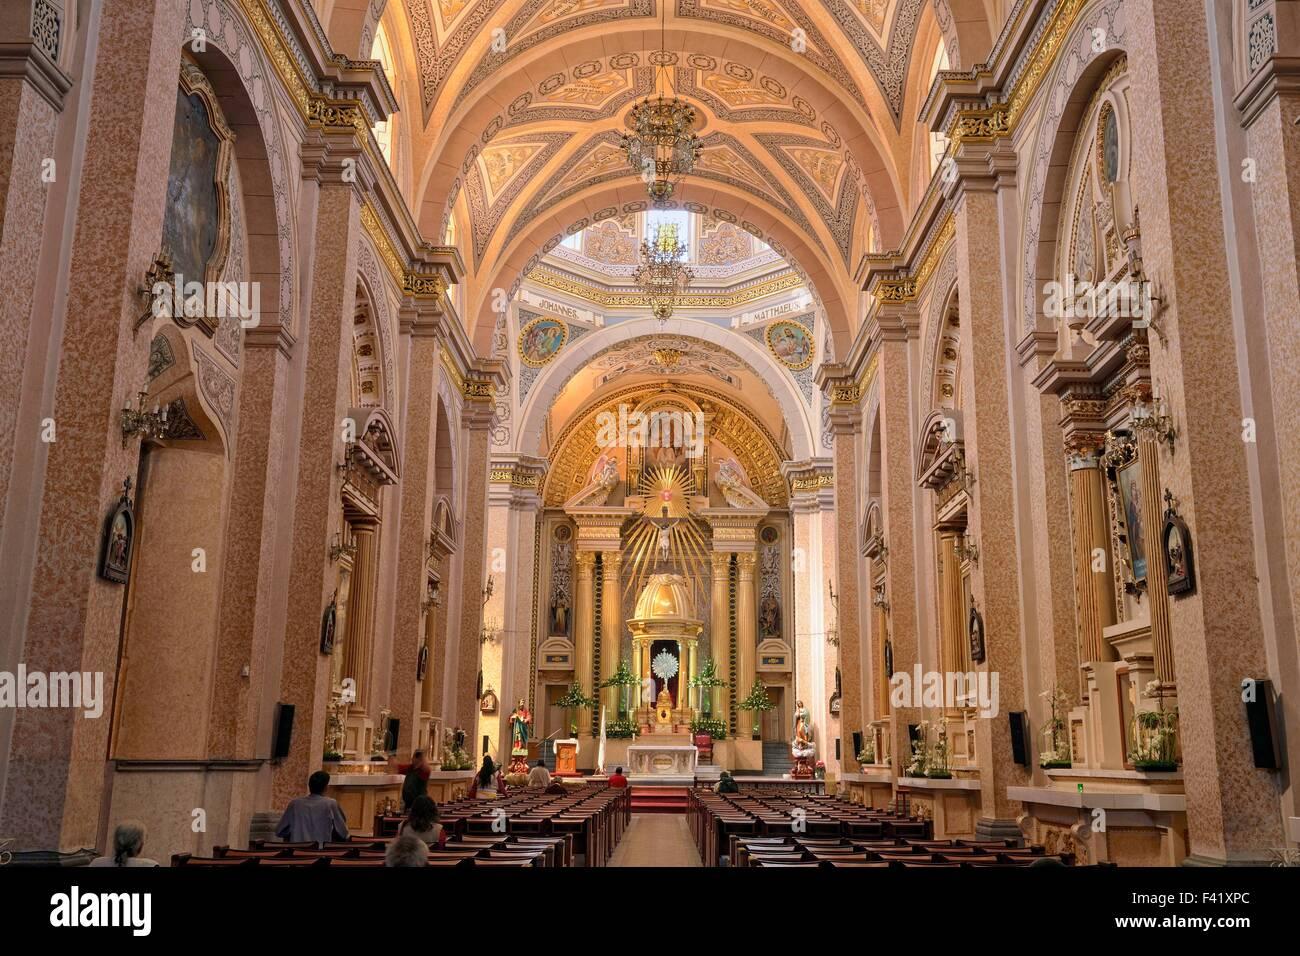 San Pedro Apostle church, interior, Cholula, Puebla, Mexico - Stock Image